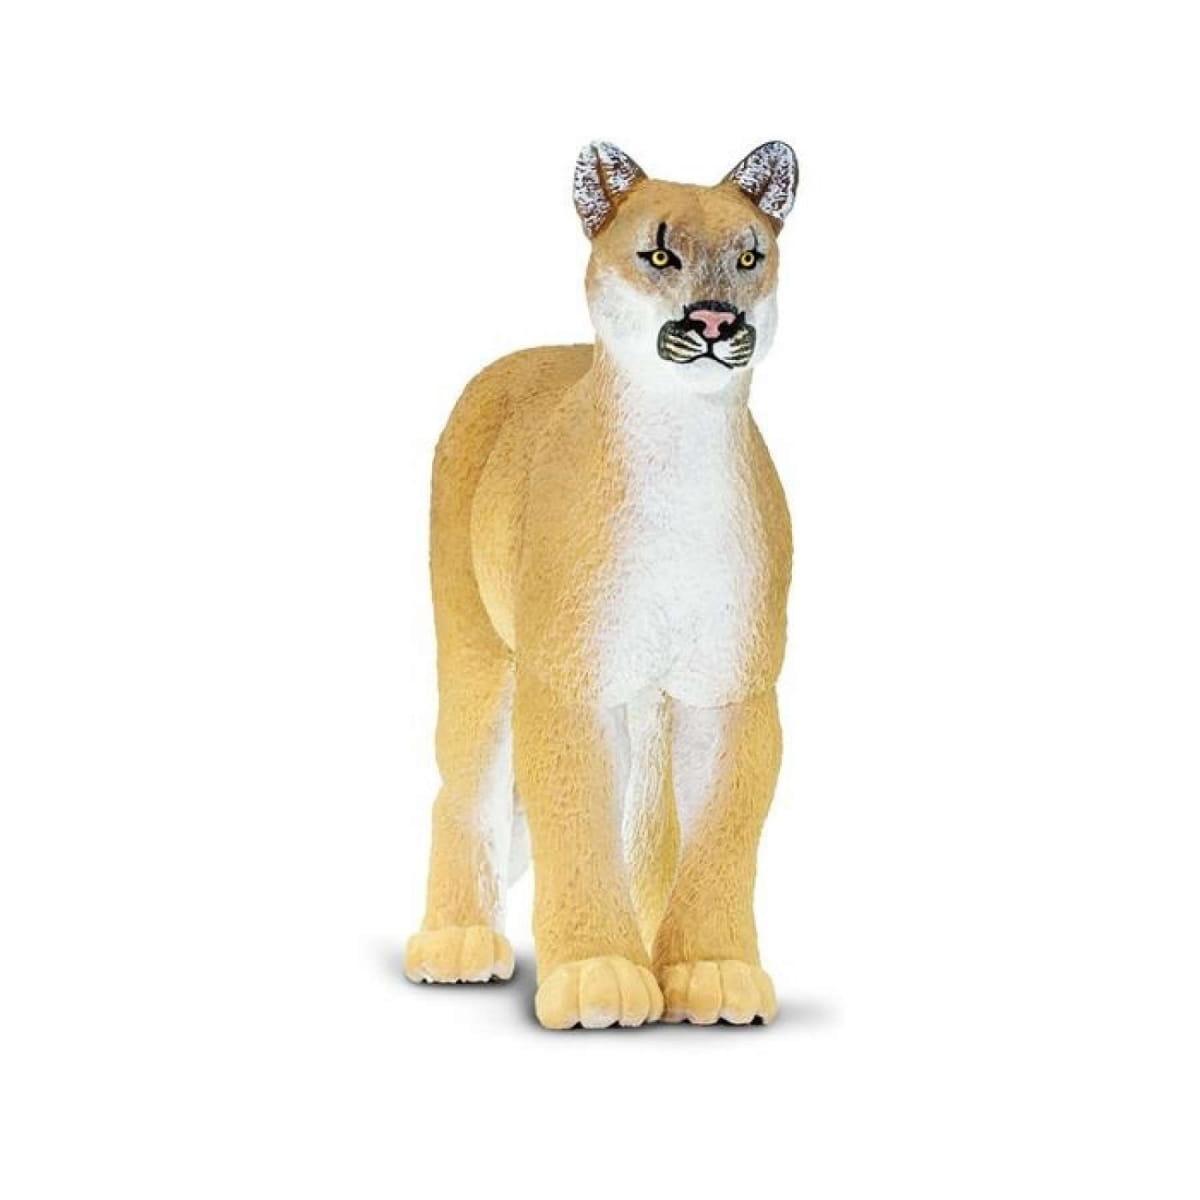 Фигурка SAFARI Флоридская пума XL - Фигурки животных